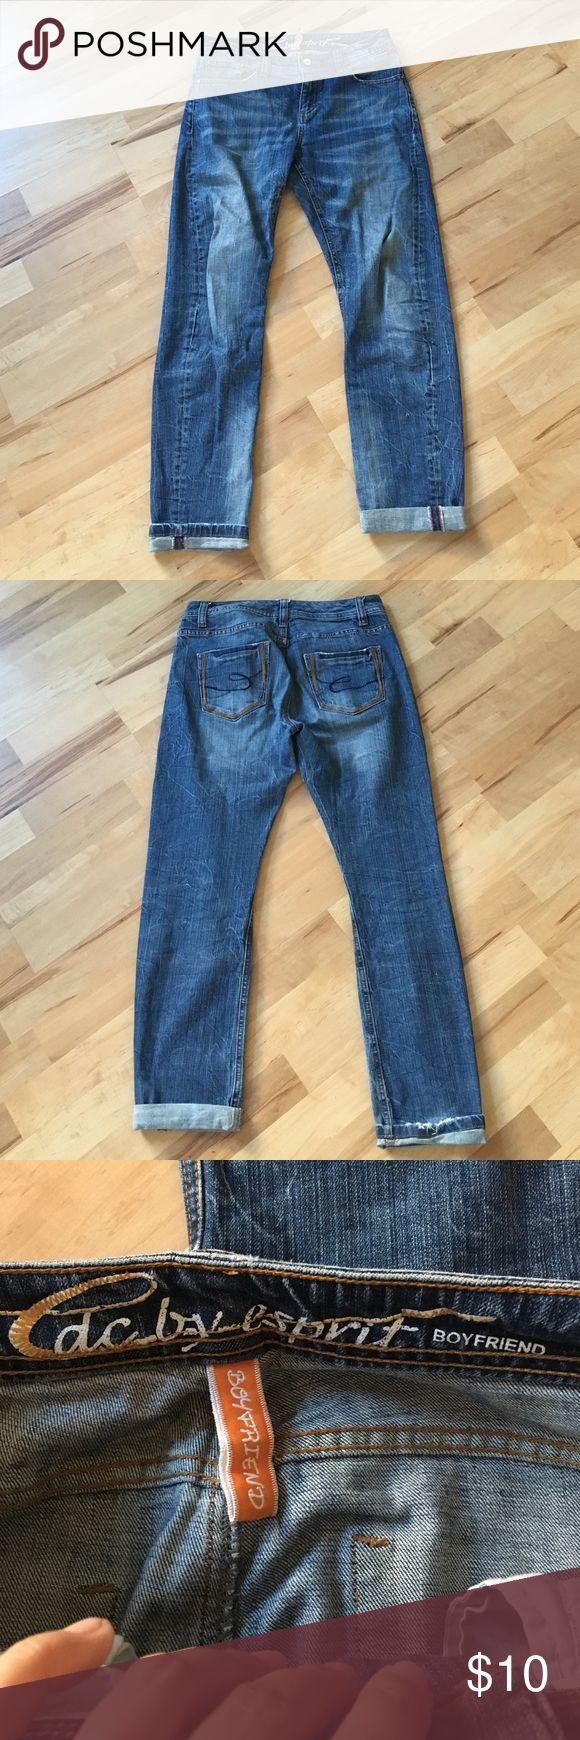 Esprit Boyfriend Jeans Esprit Boyfriend Jeans Esprit Jeans Boyfriend